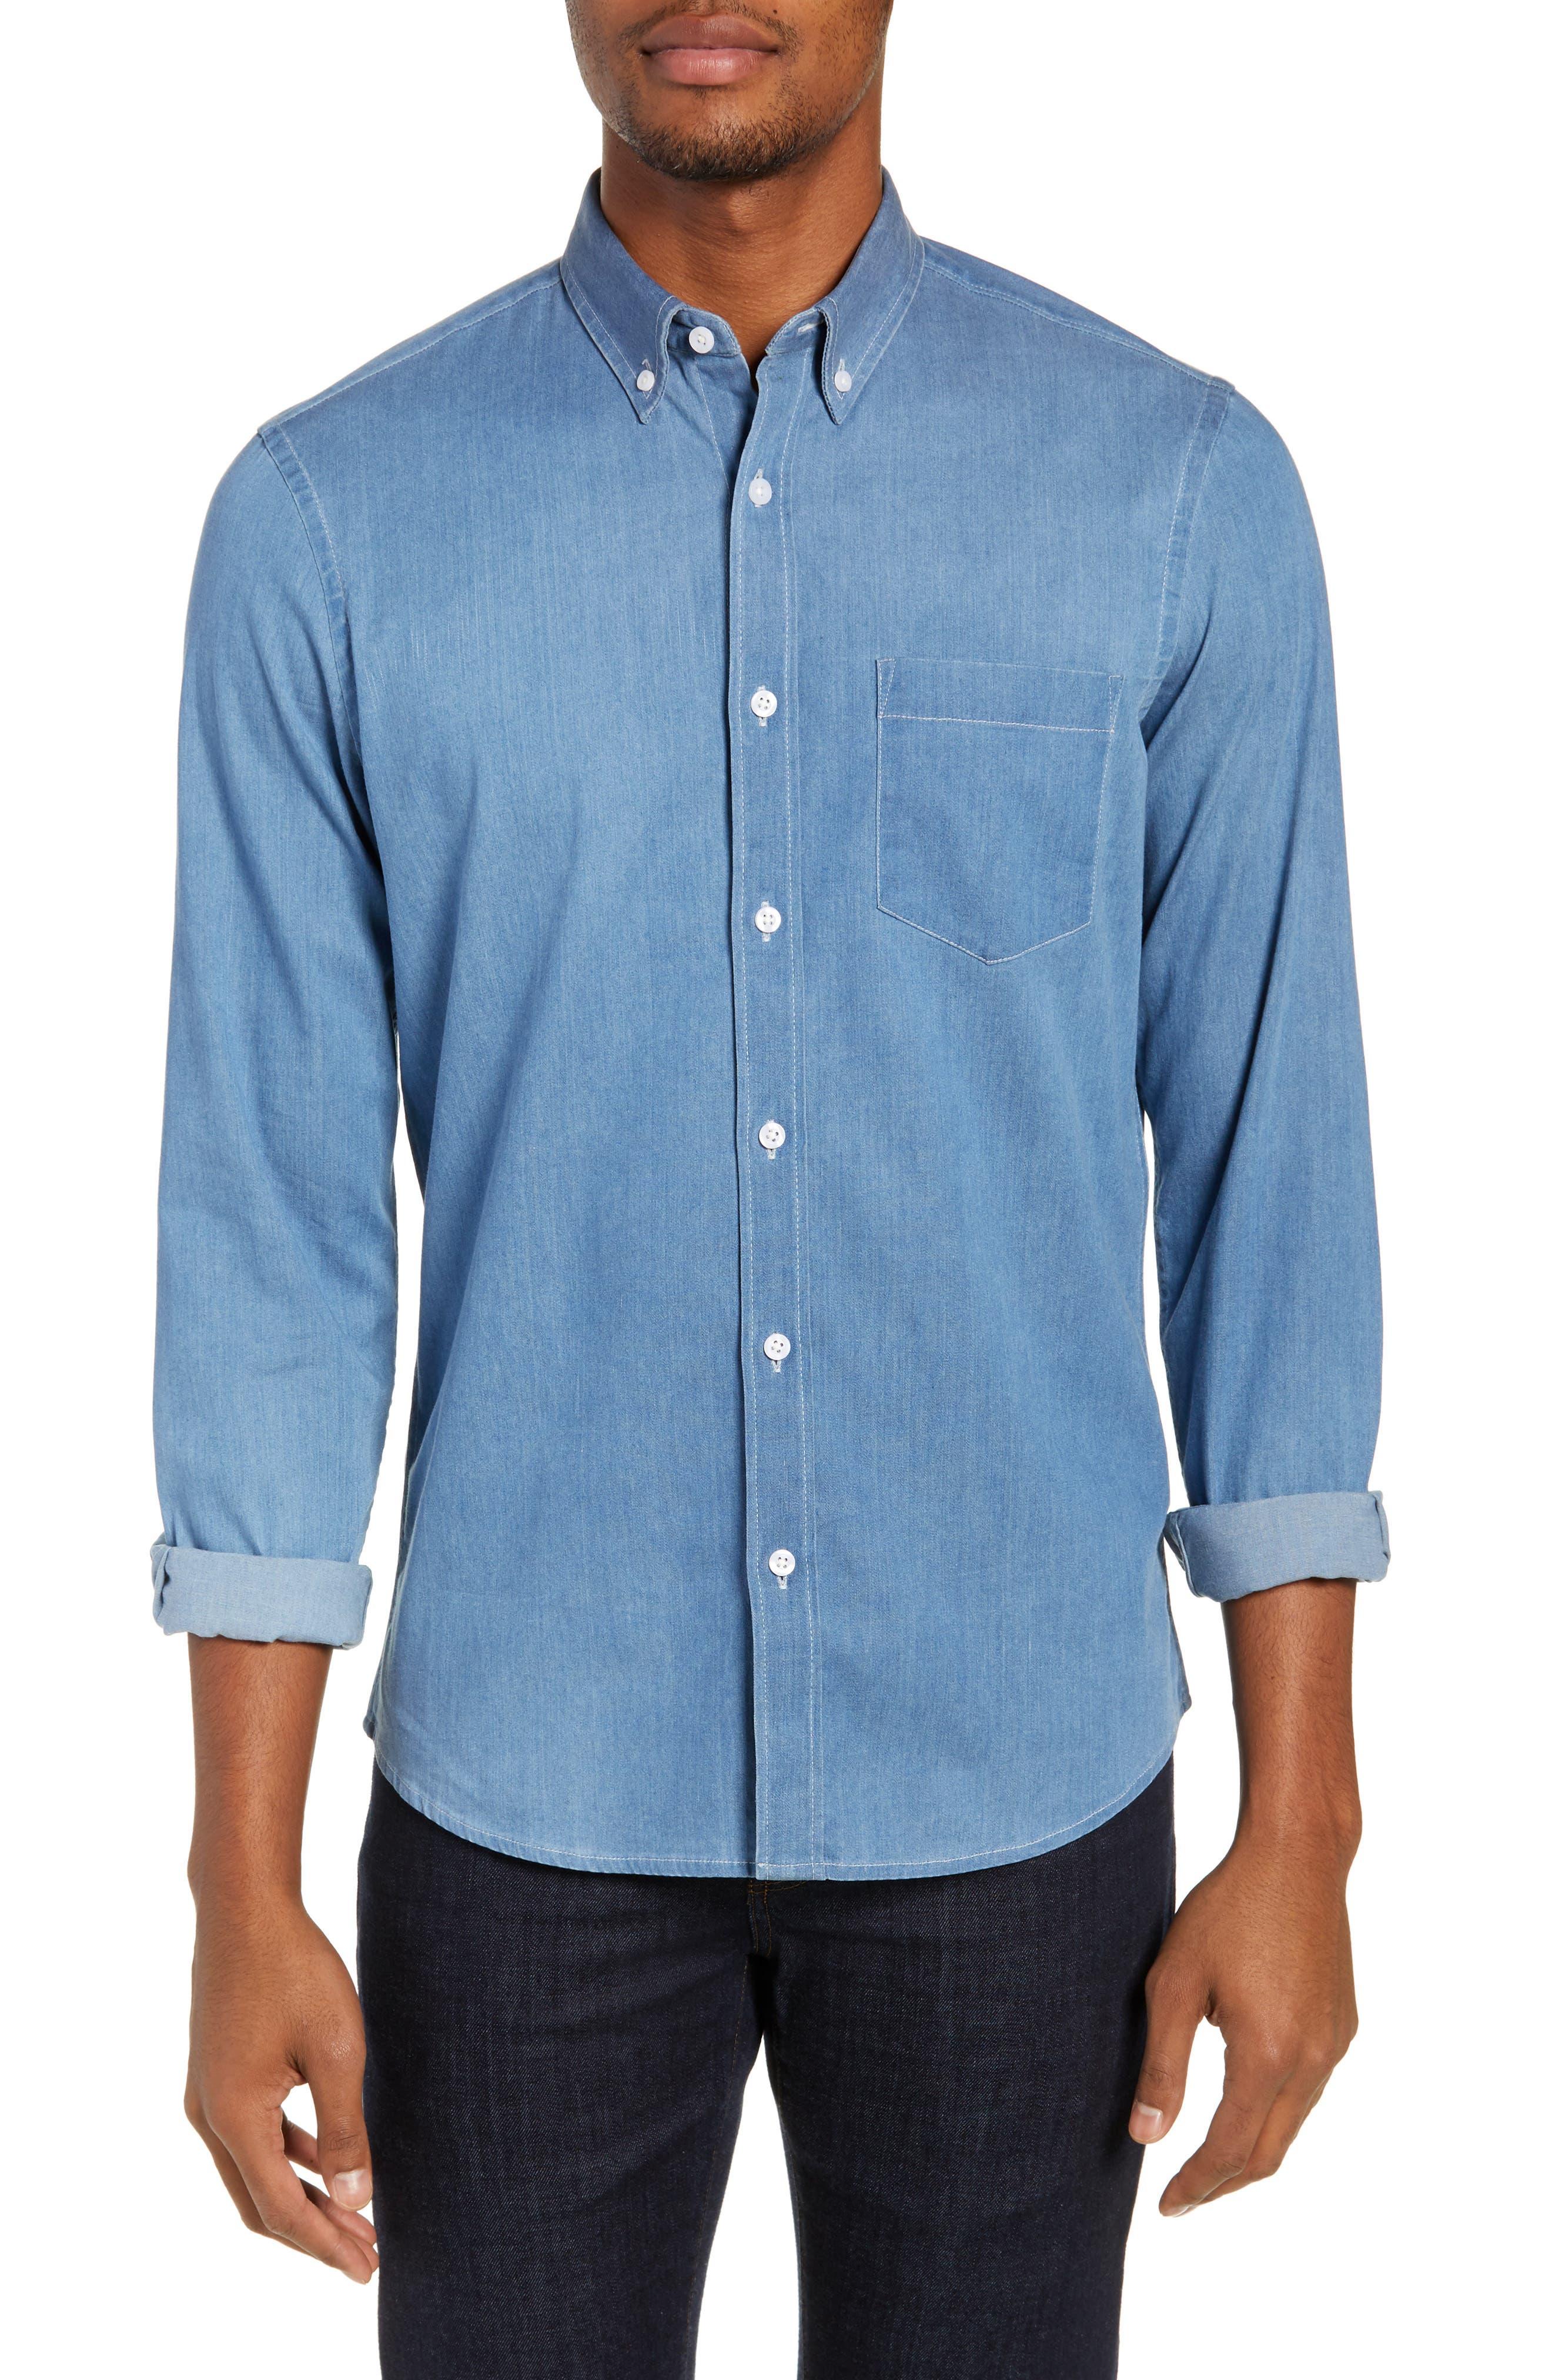 Nordstrom Shop Trim Fit Chambray Sport Shirt, Blue